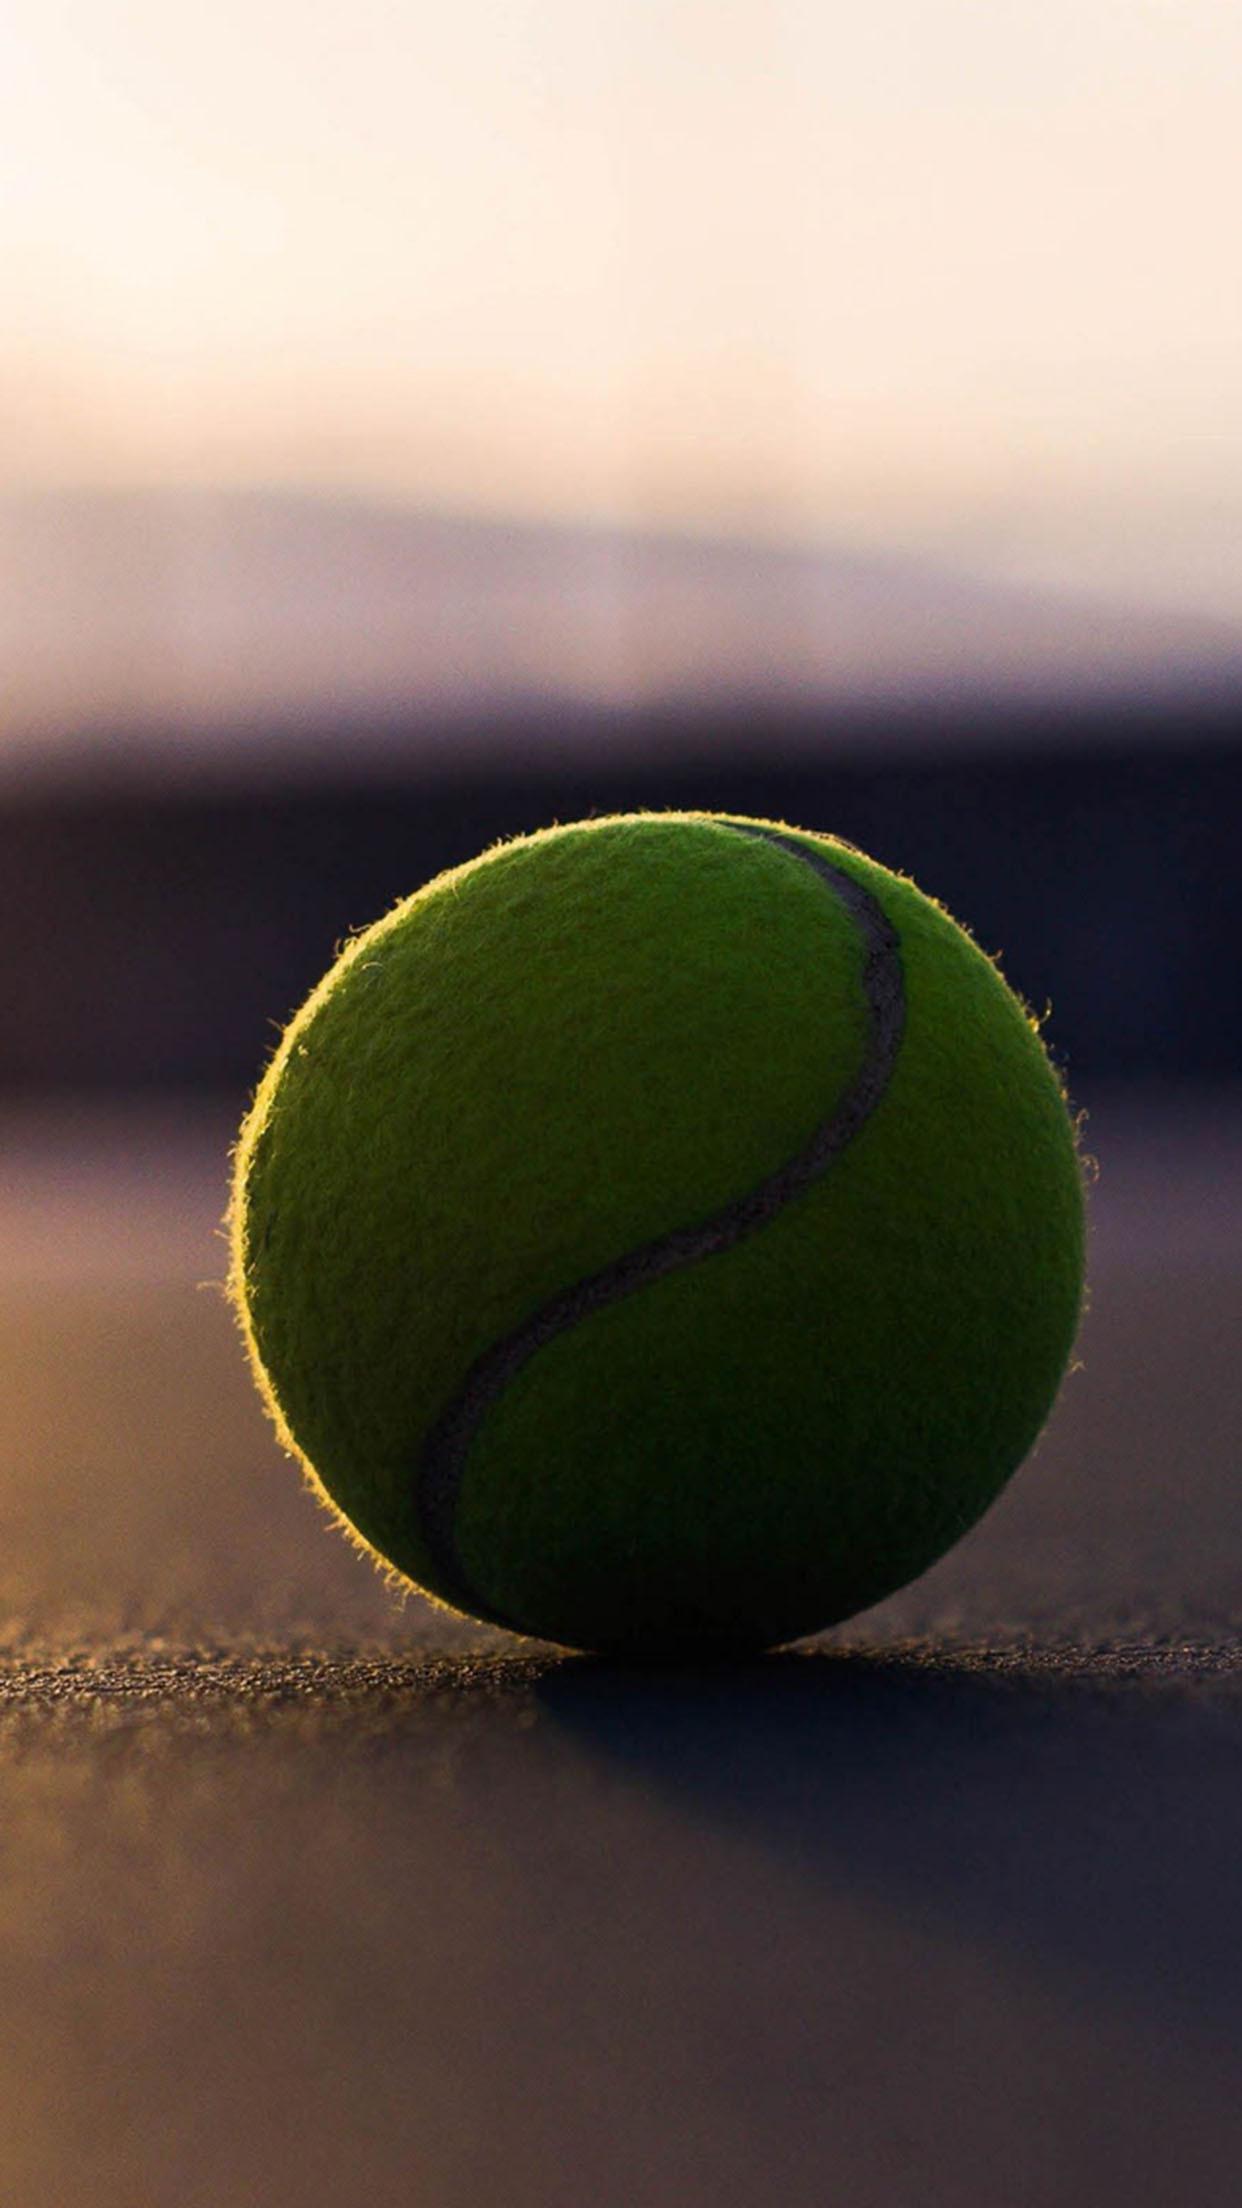 Wallpaper HD iPhone Tennis ball – Free Download